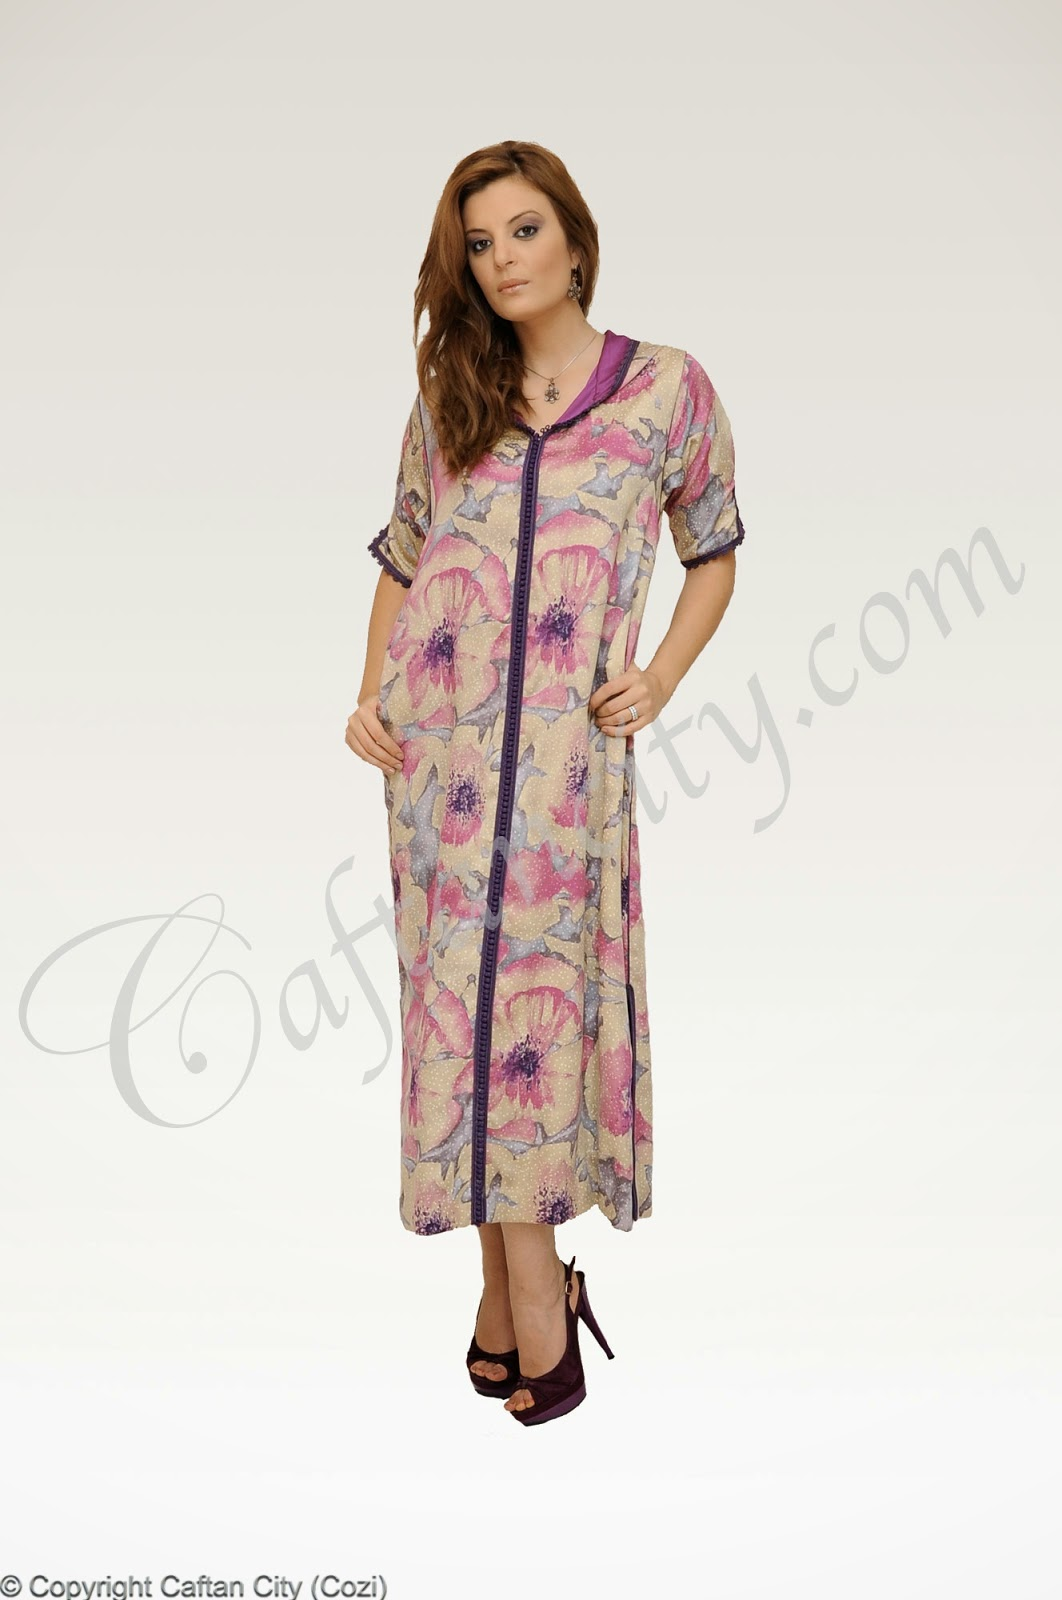 Djellaba, djellaba violet, djellaba rose, djellaba luxe, djellaba marocaine, Djellaba Mauve, djellaba moderne, djellabti, djellaba femme,